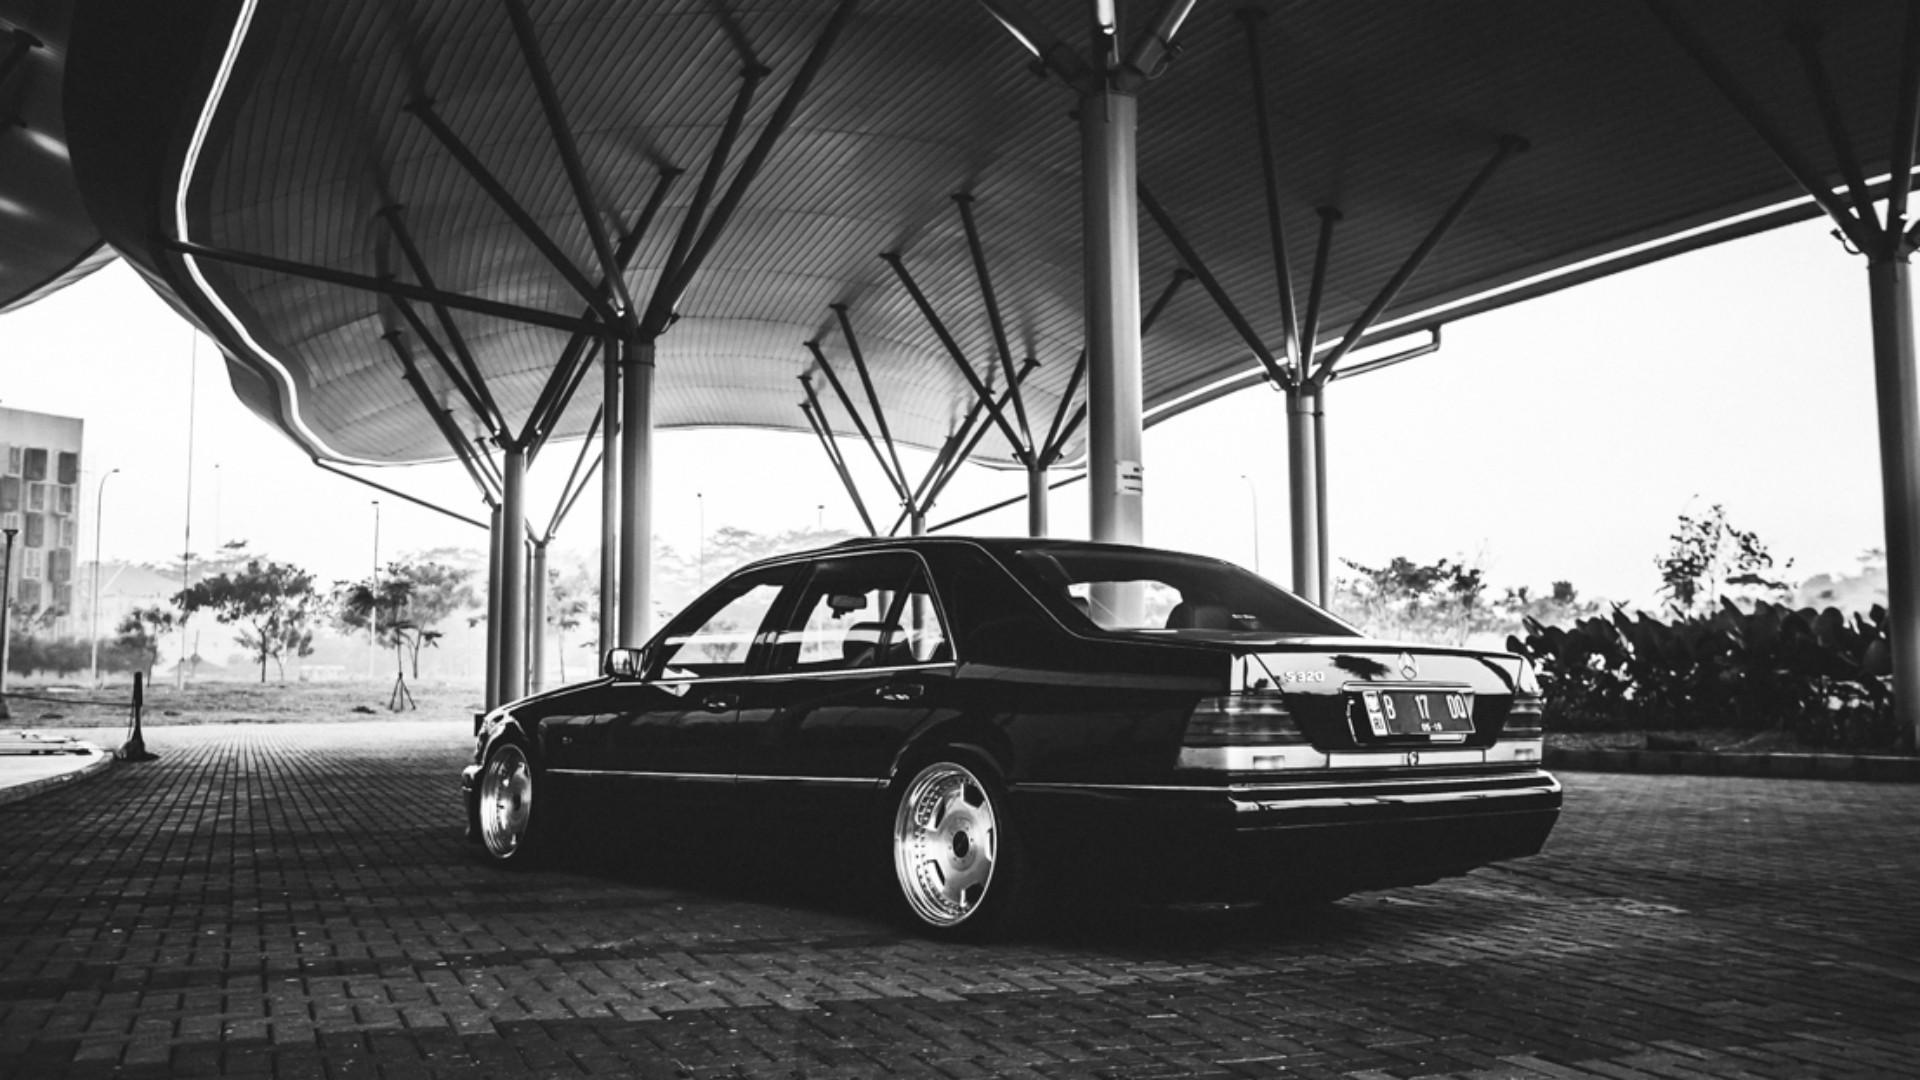 Drift Car Wallpaper Mobile Mercedes Benz Mercedes Amg Monochrome Stance Low